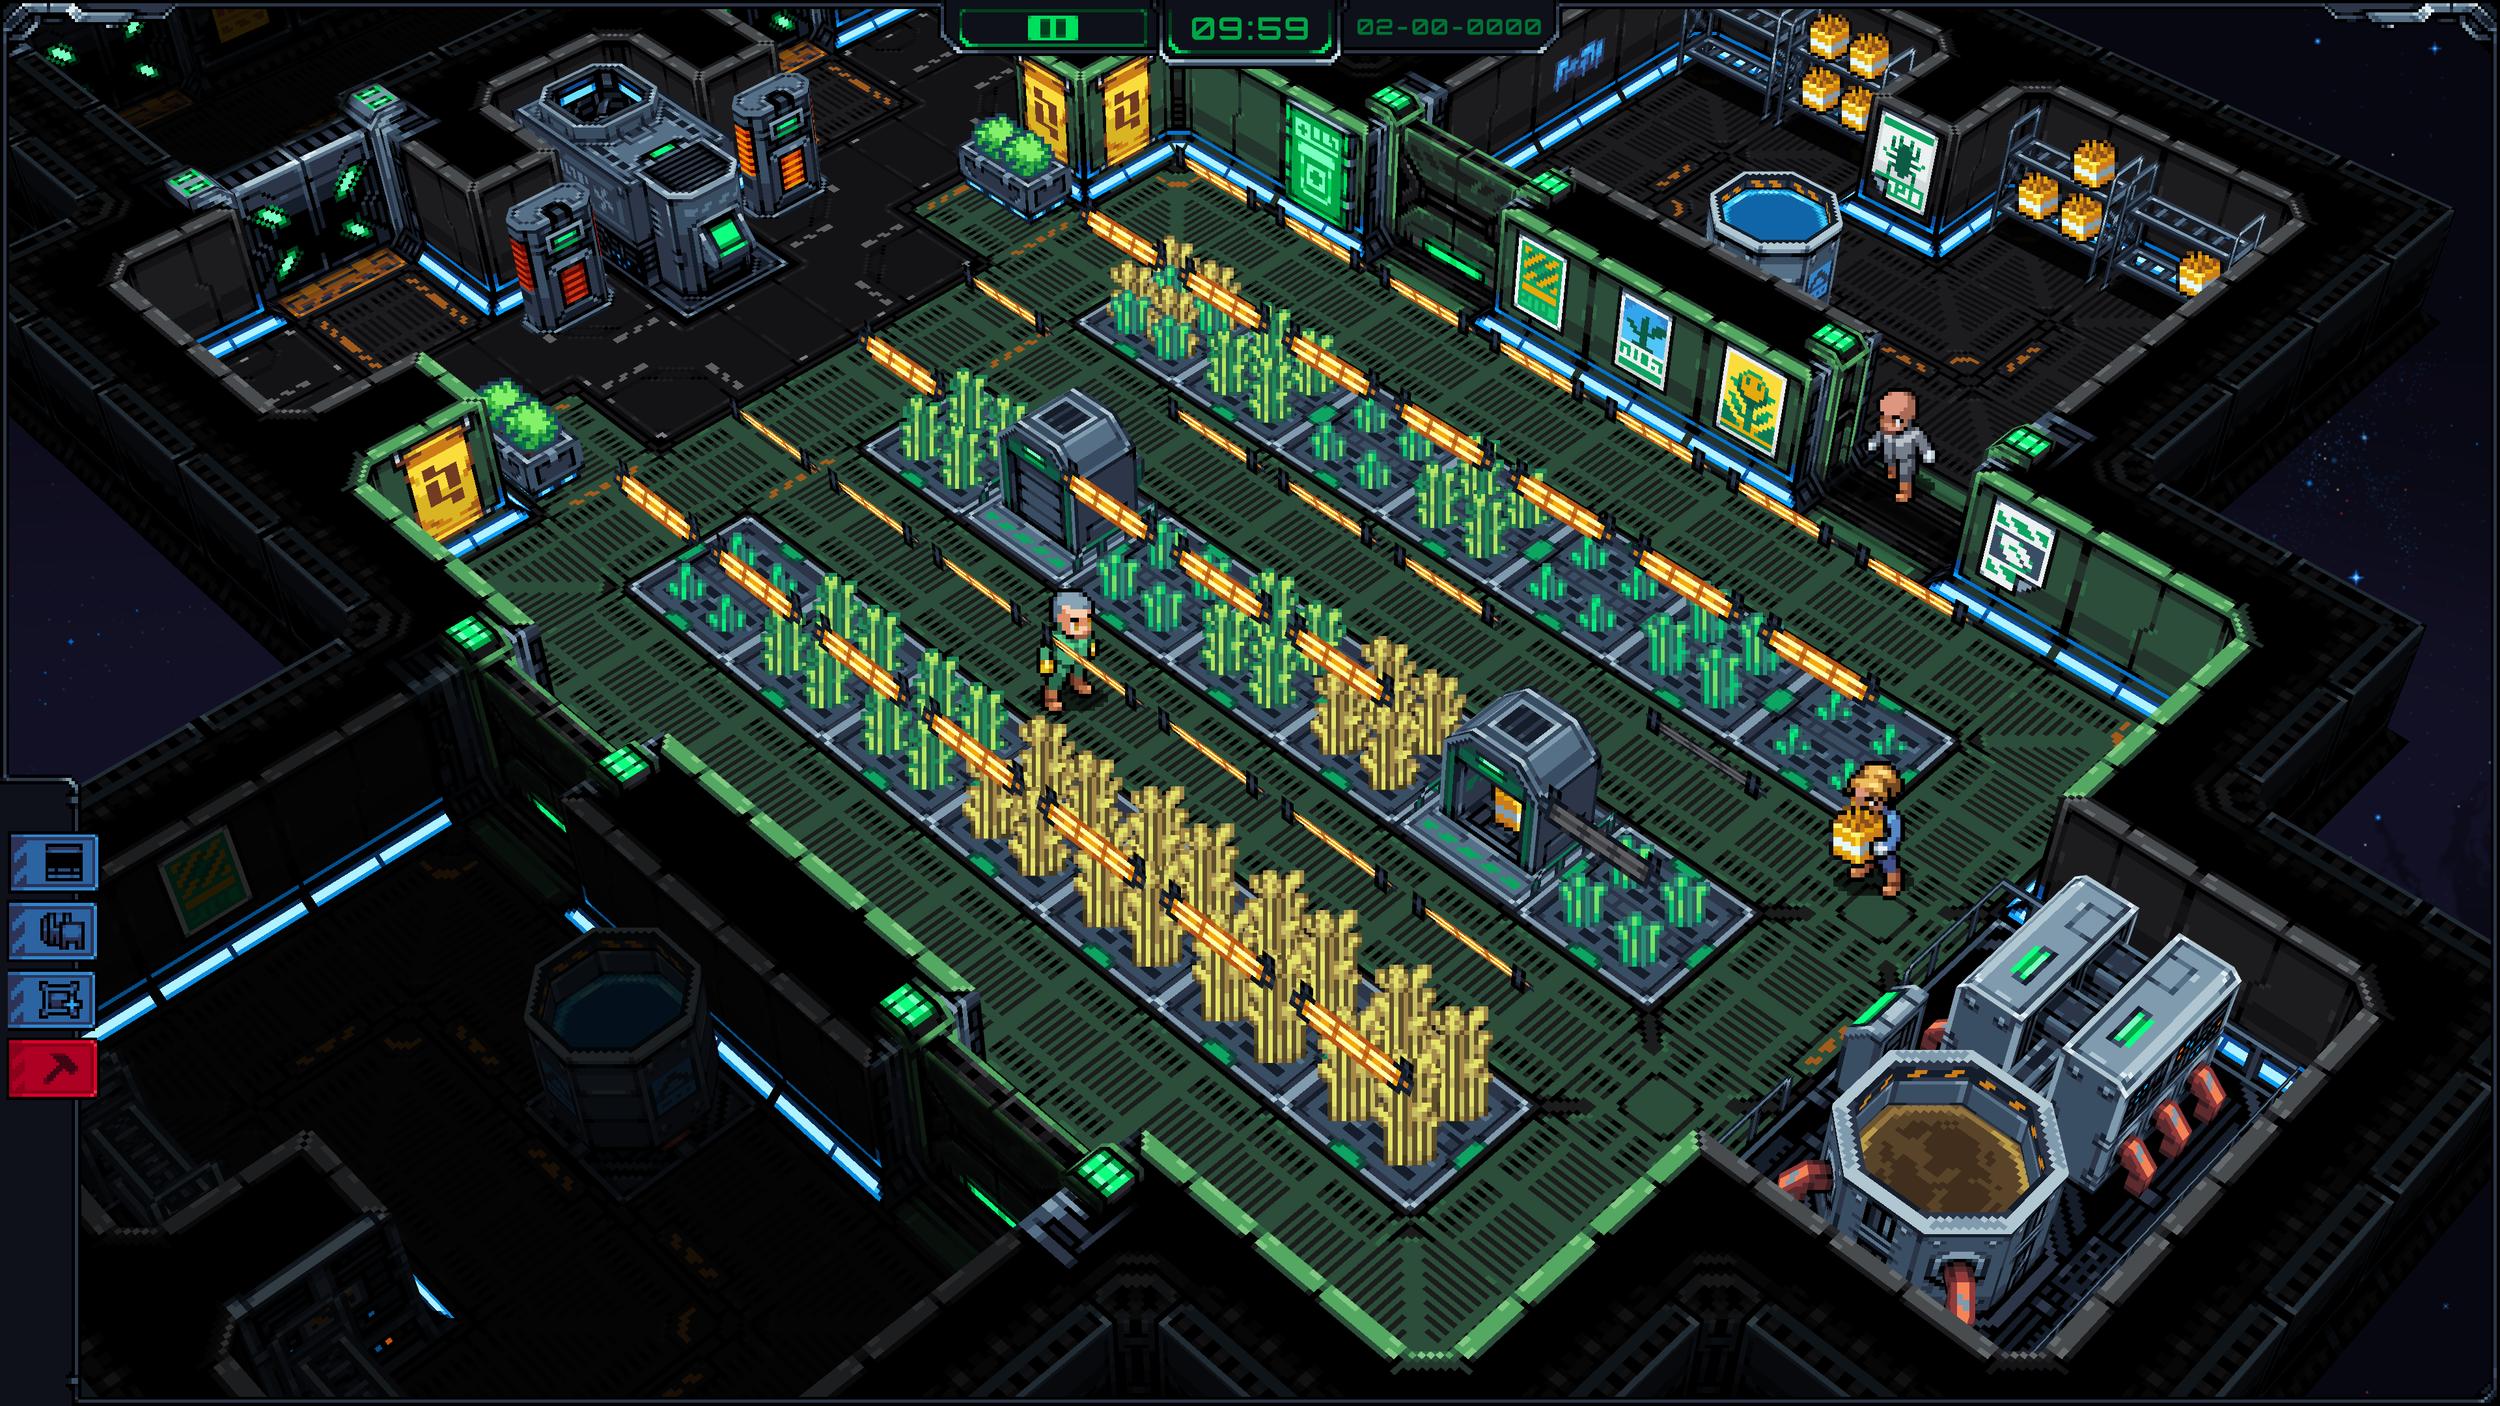 Wheat farm, and random infrastructure